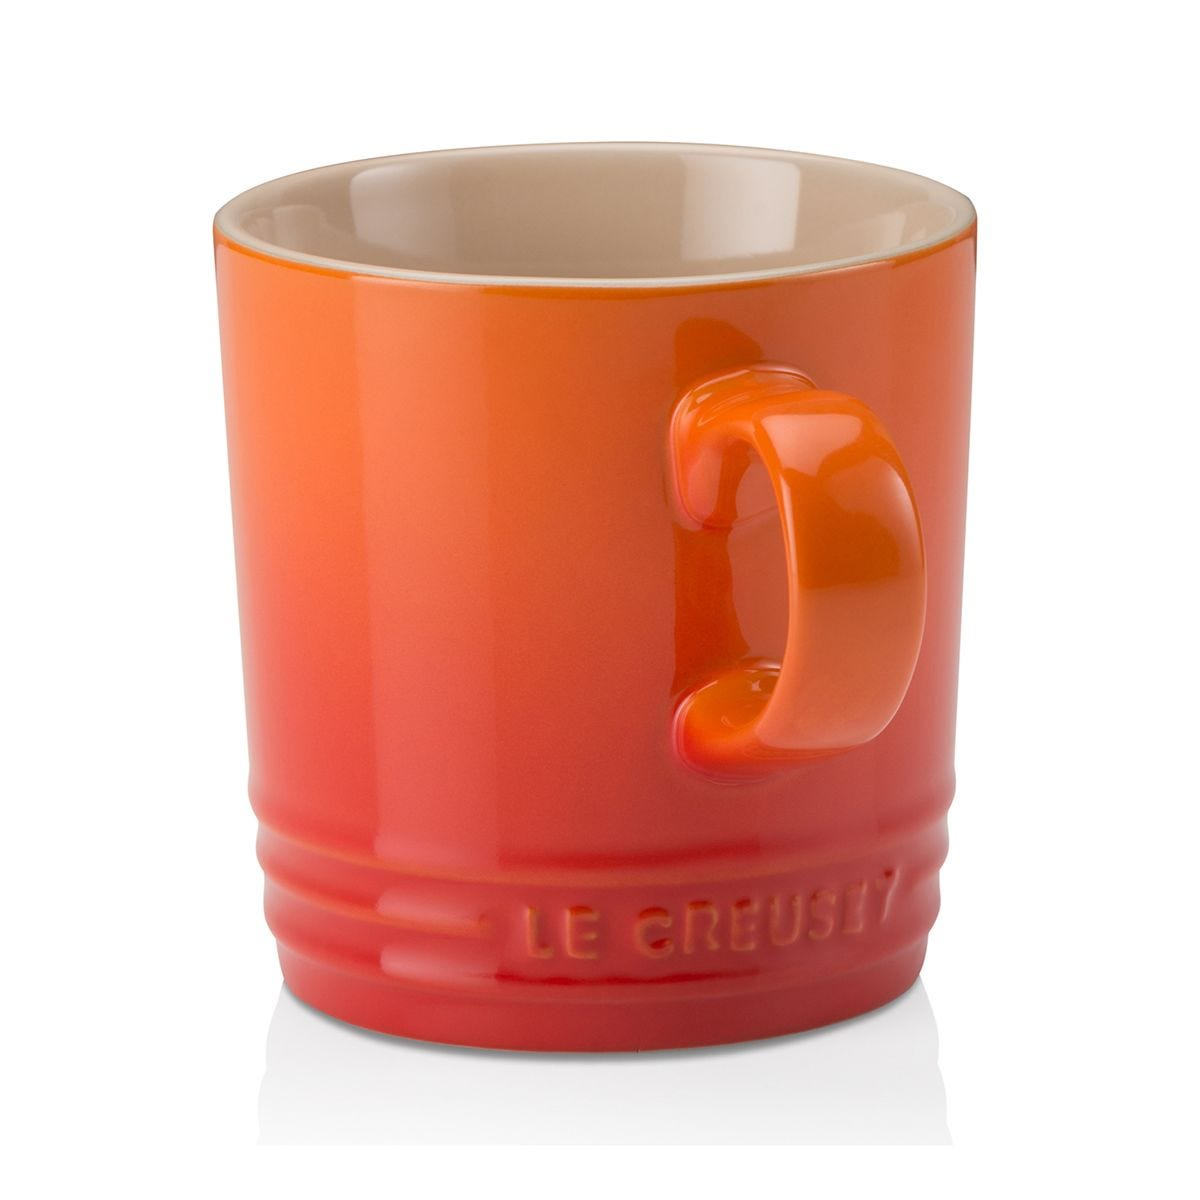 Le Creuset Stoneware Mug 350ml Volcanic